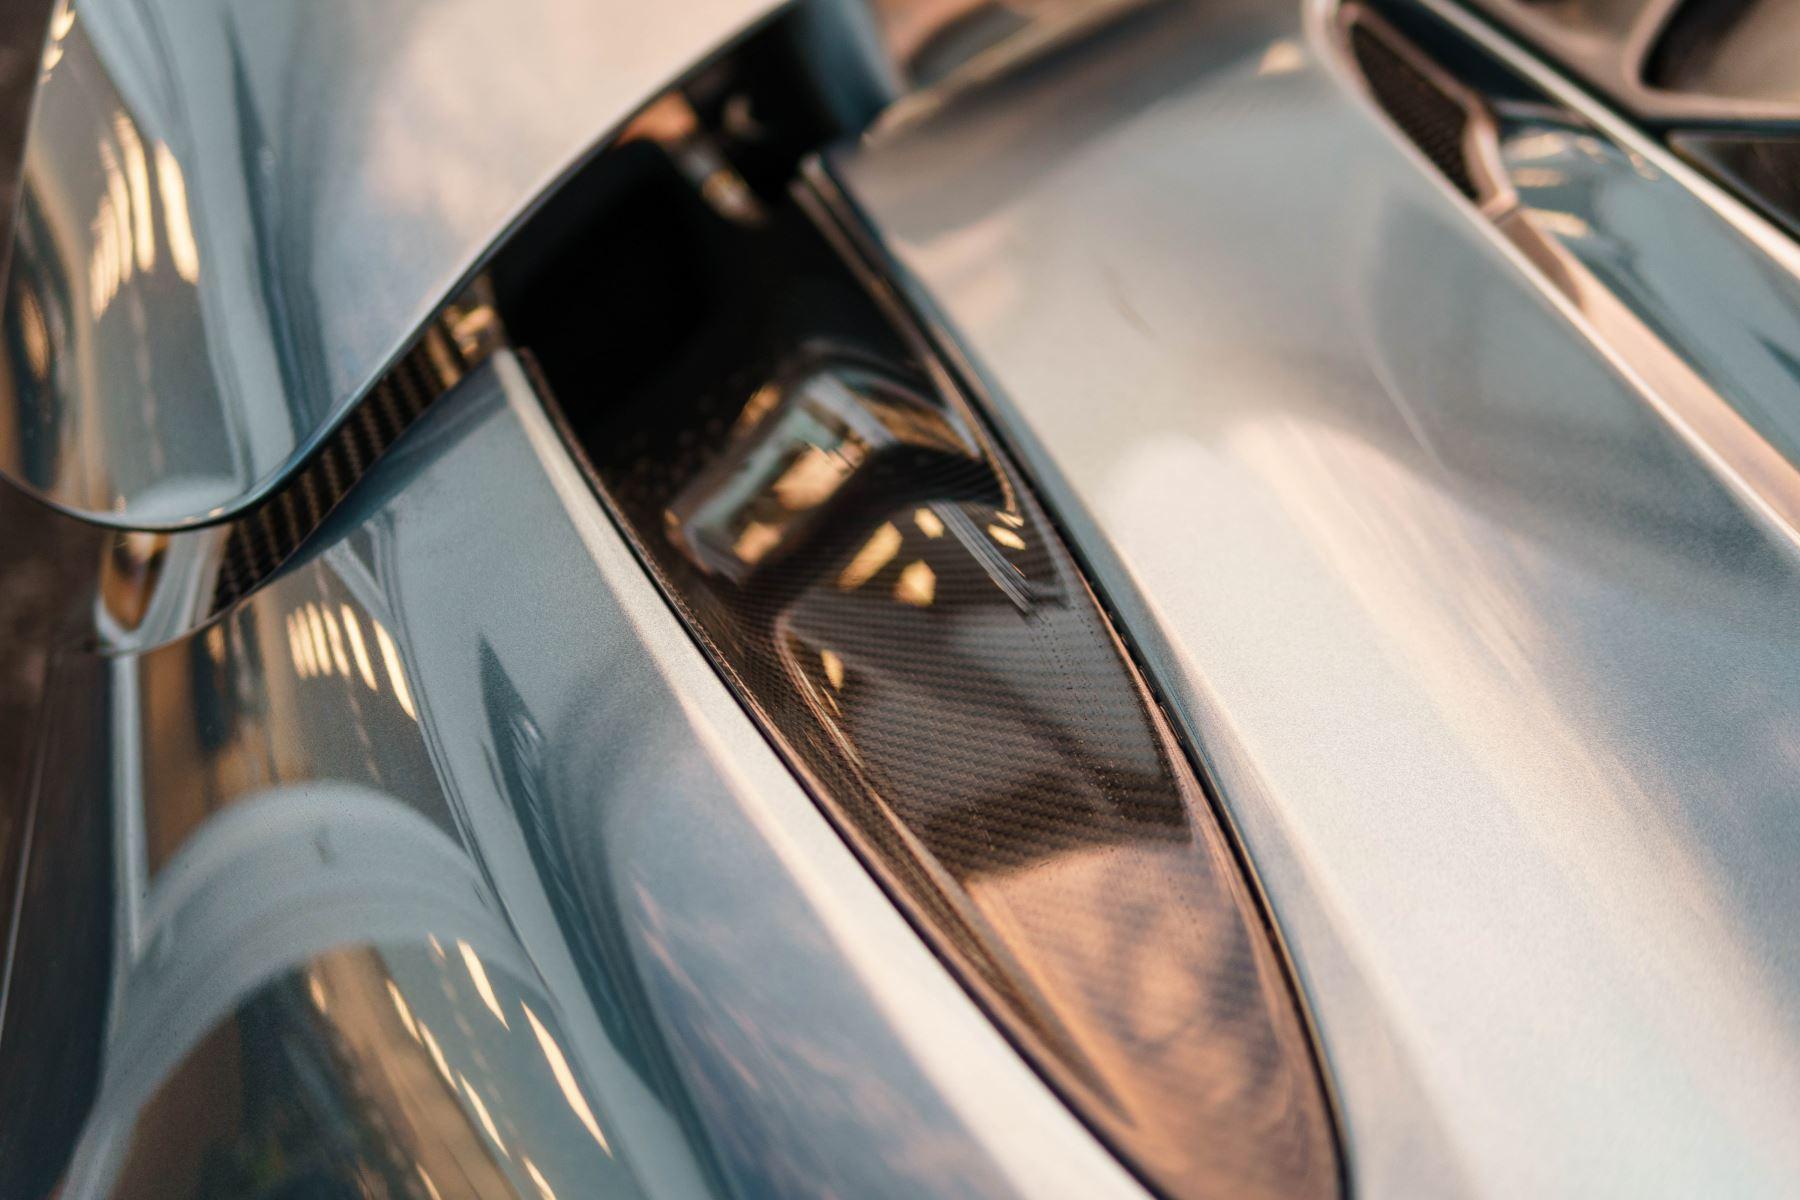 McLaren 720S Performance Coupe  image 9